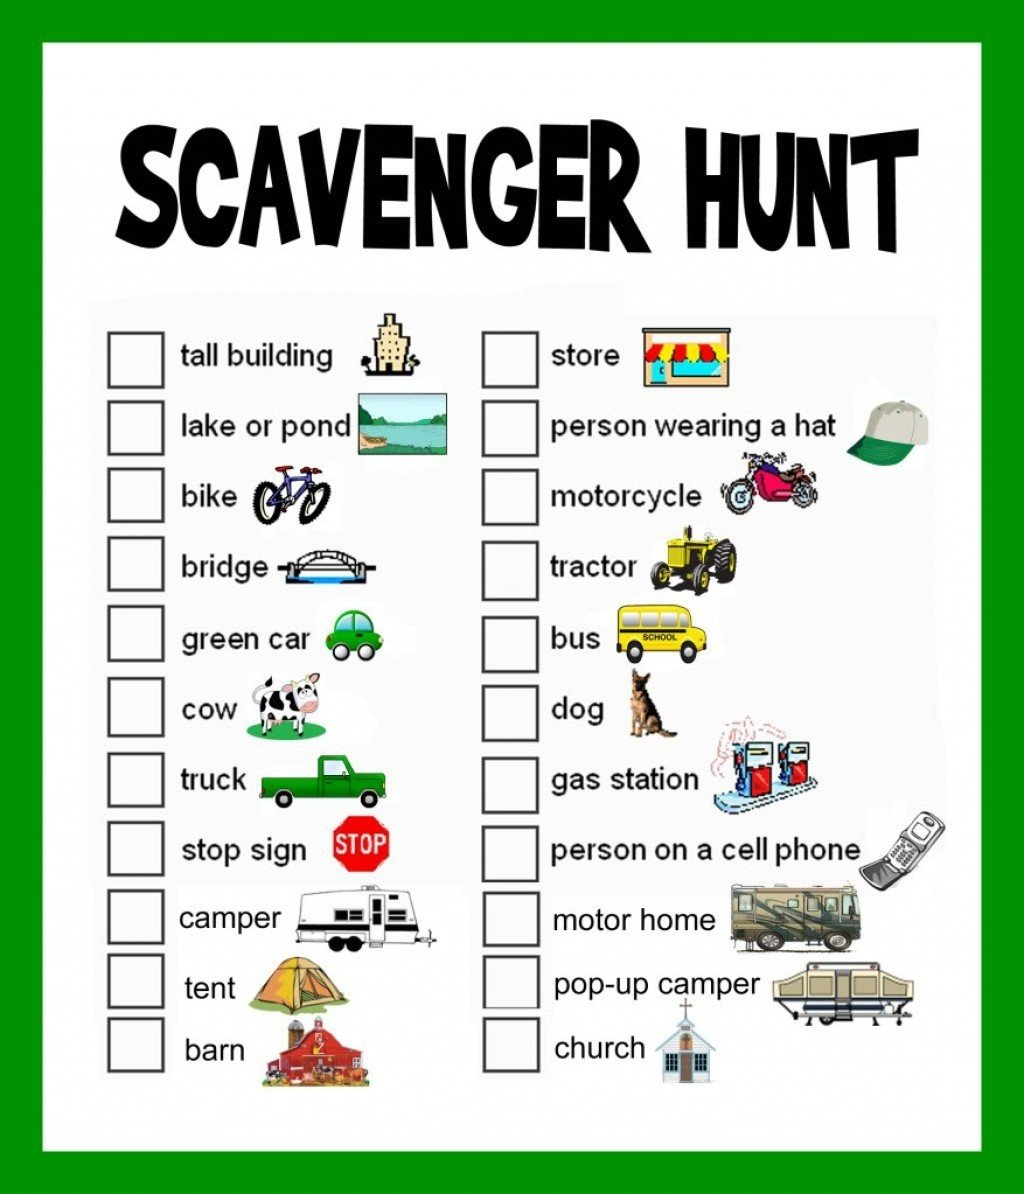 10 Amazing Ideas For A Scavenger Hunt 5 super fun scavenger hunt ideas road trips vacation and road trippin 2 2021